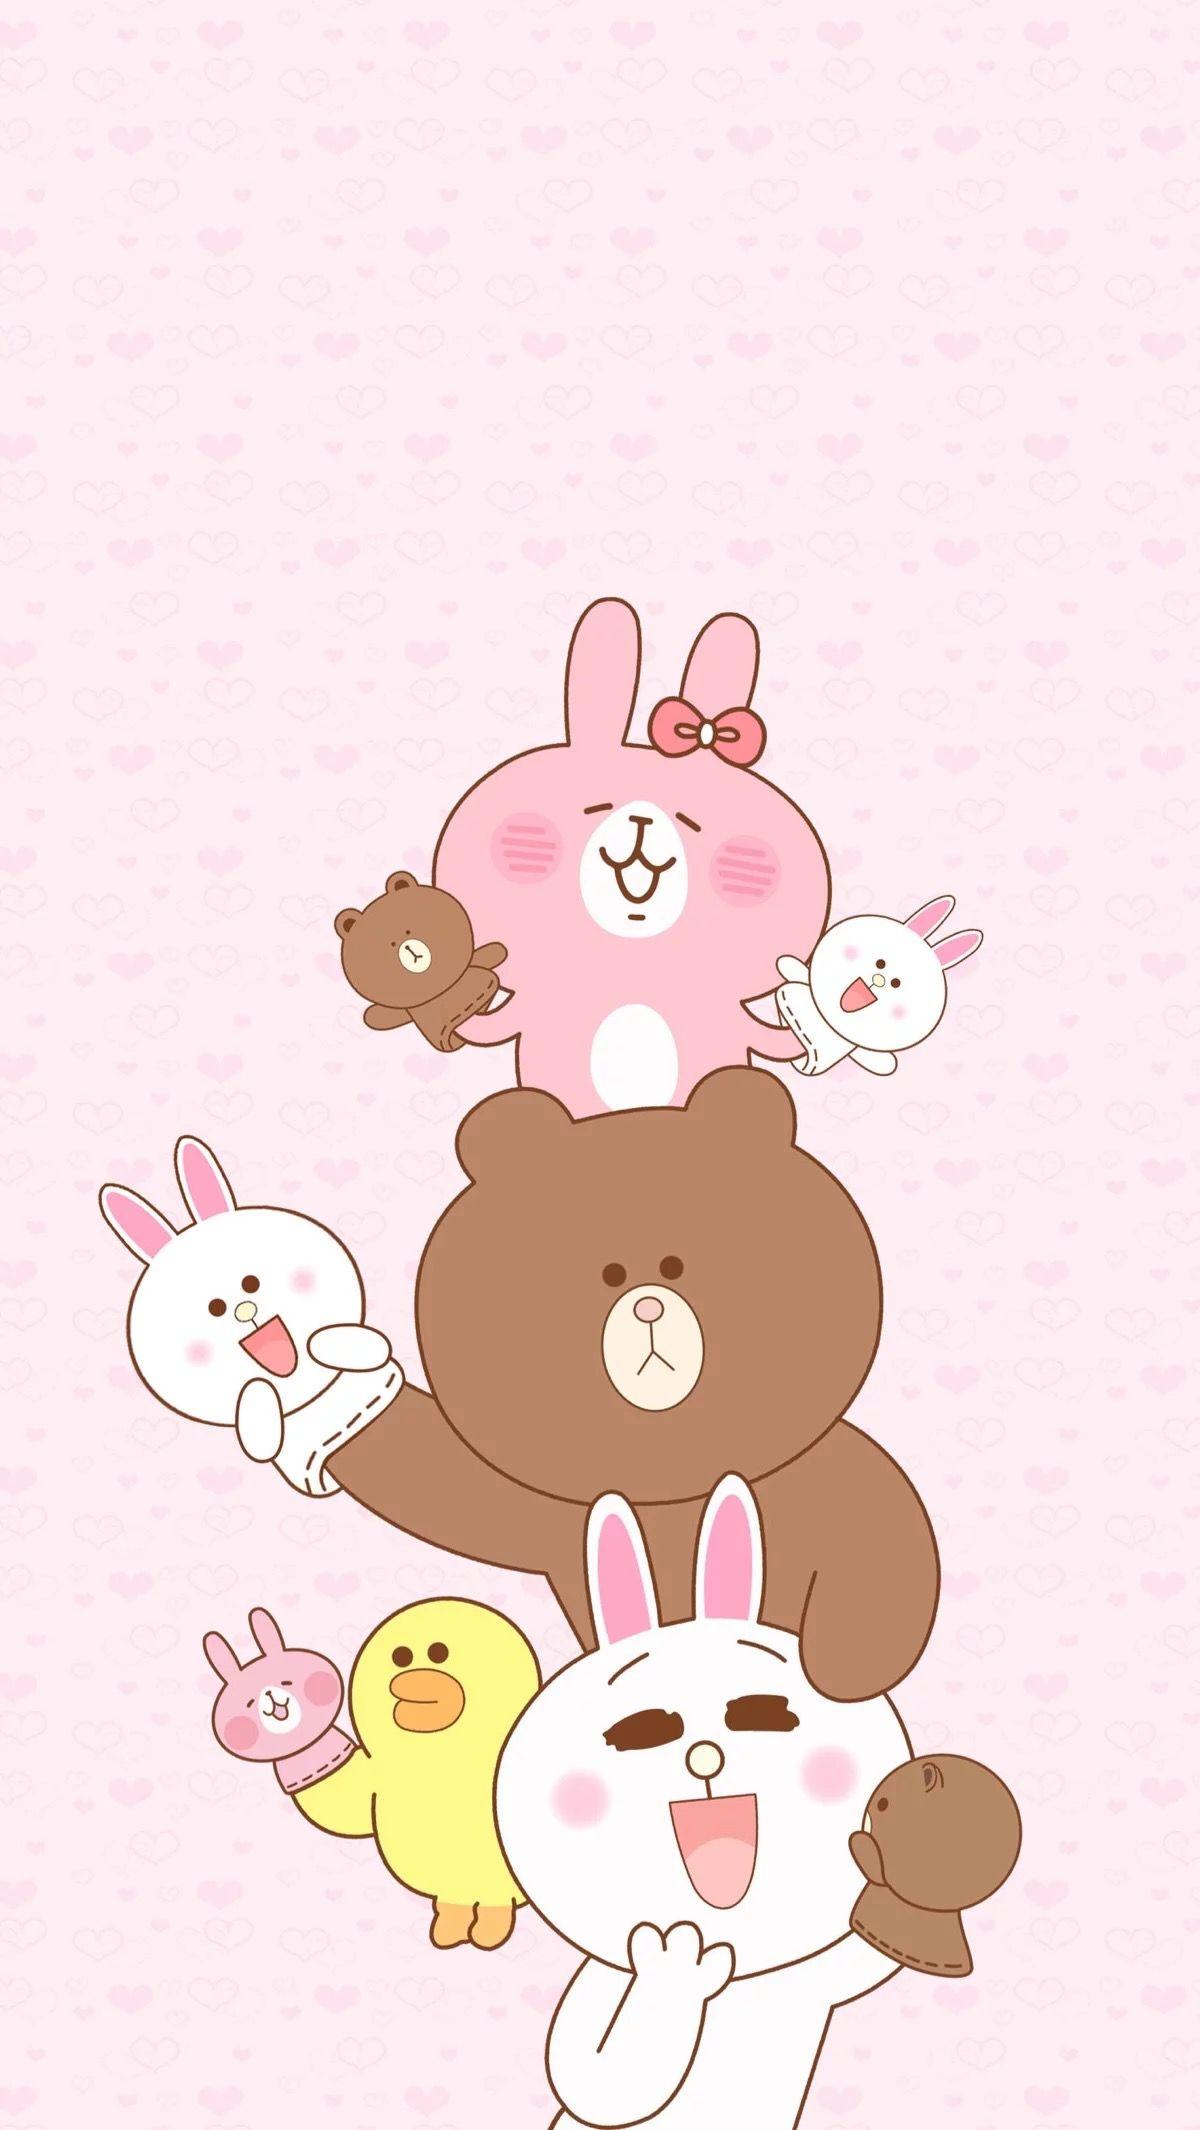 Cute Teddy Bears Wallpapers Hd Pin Oleh Pankeawป่านแก้ว Di Wallpaper Line Wallpaper